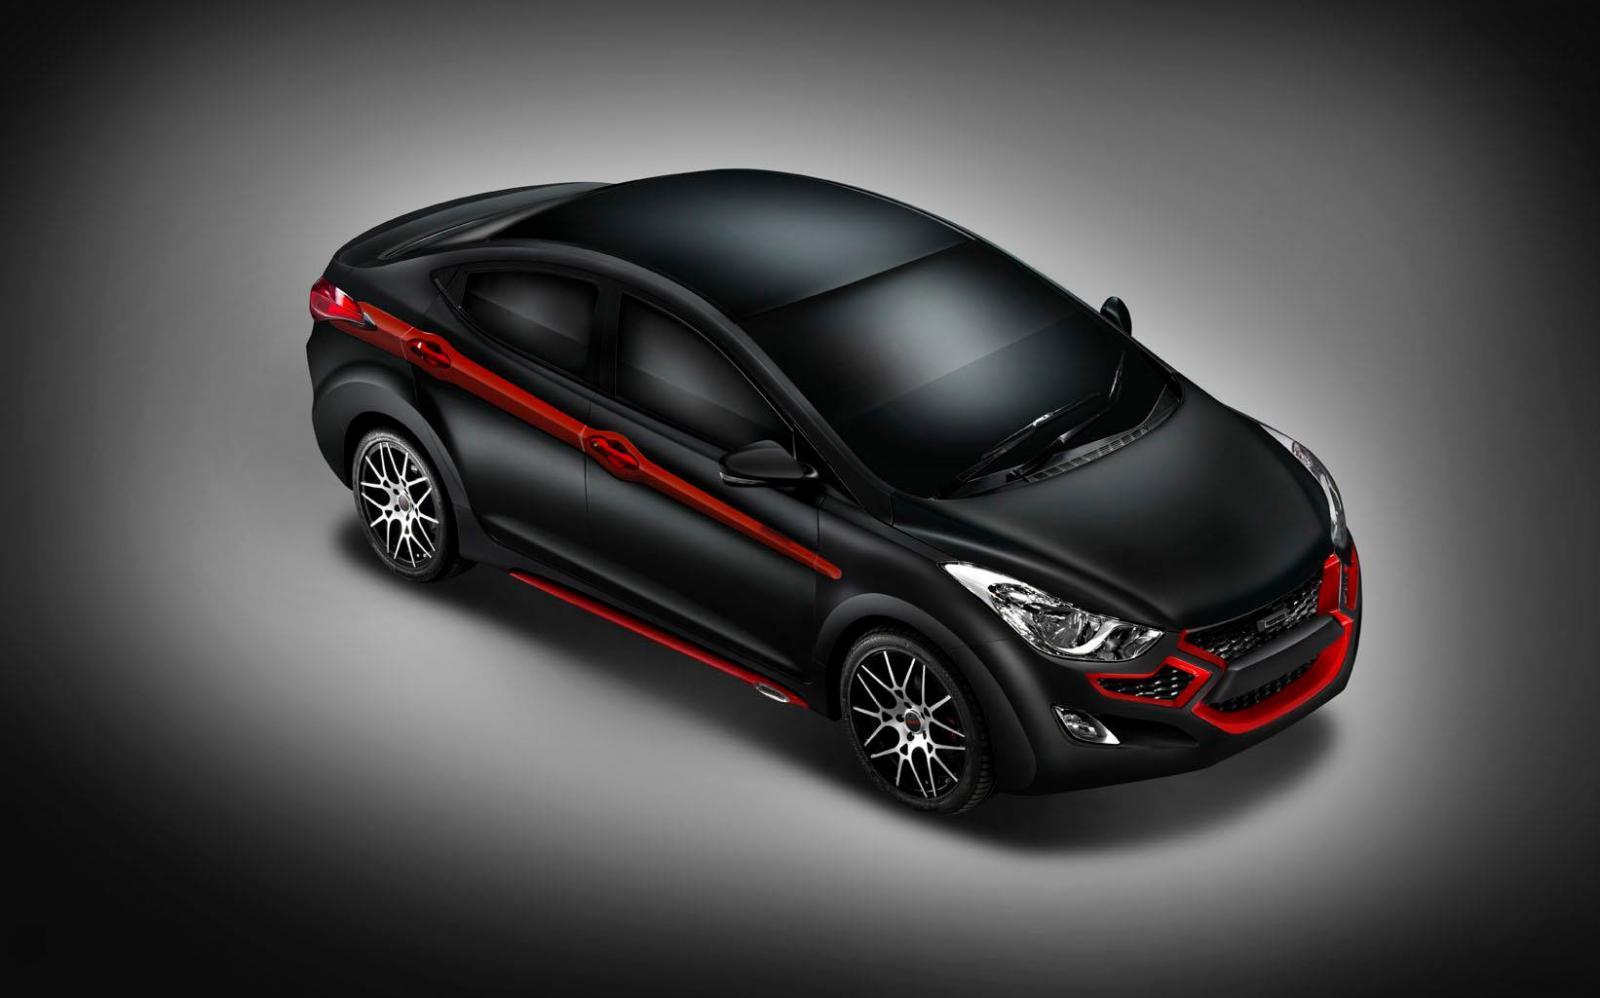 Hyundai Elantra Gets New Looks From Dc Design Autoevolution